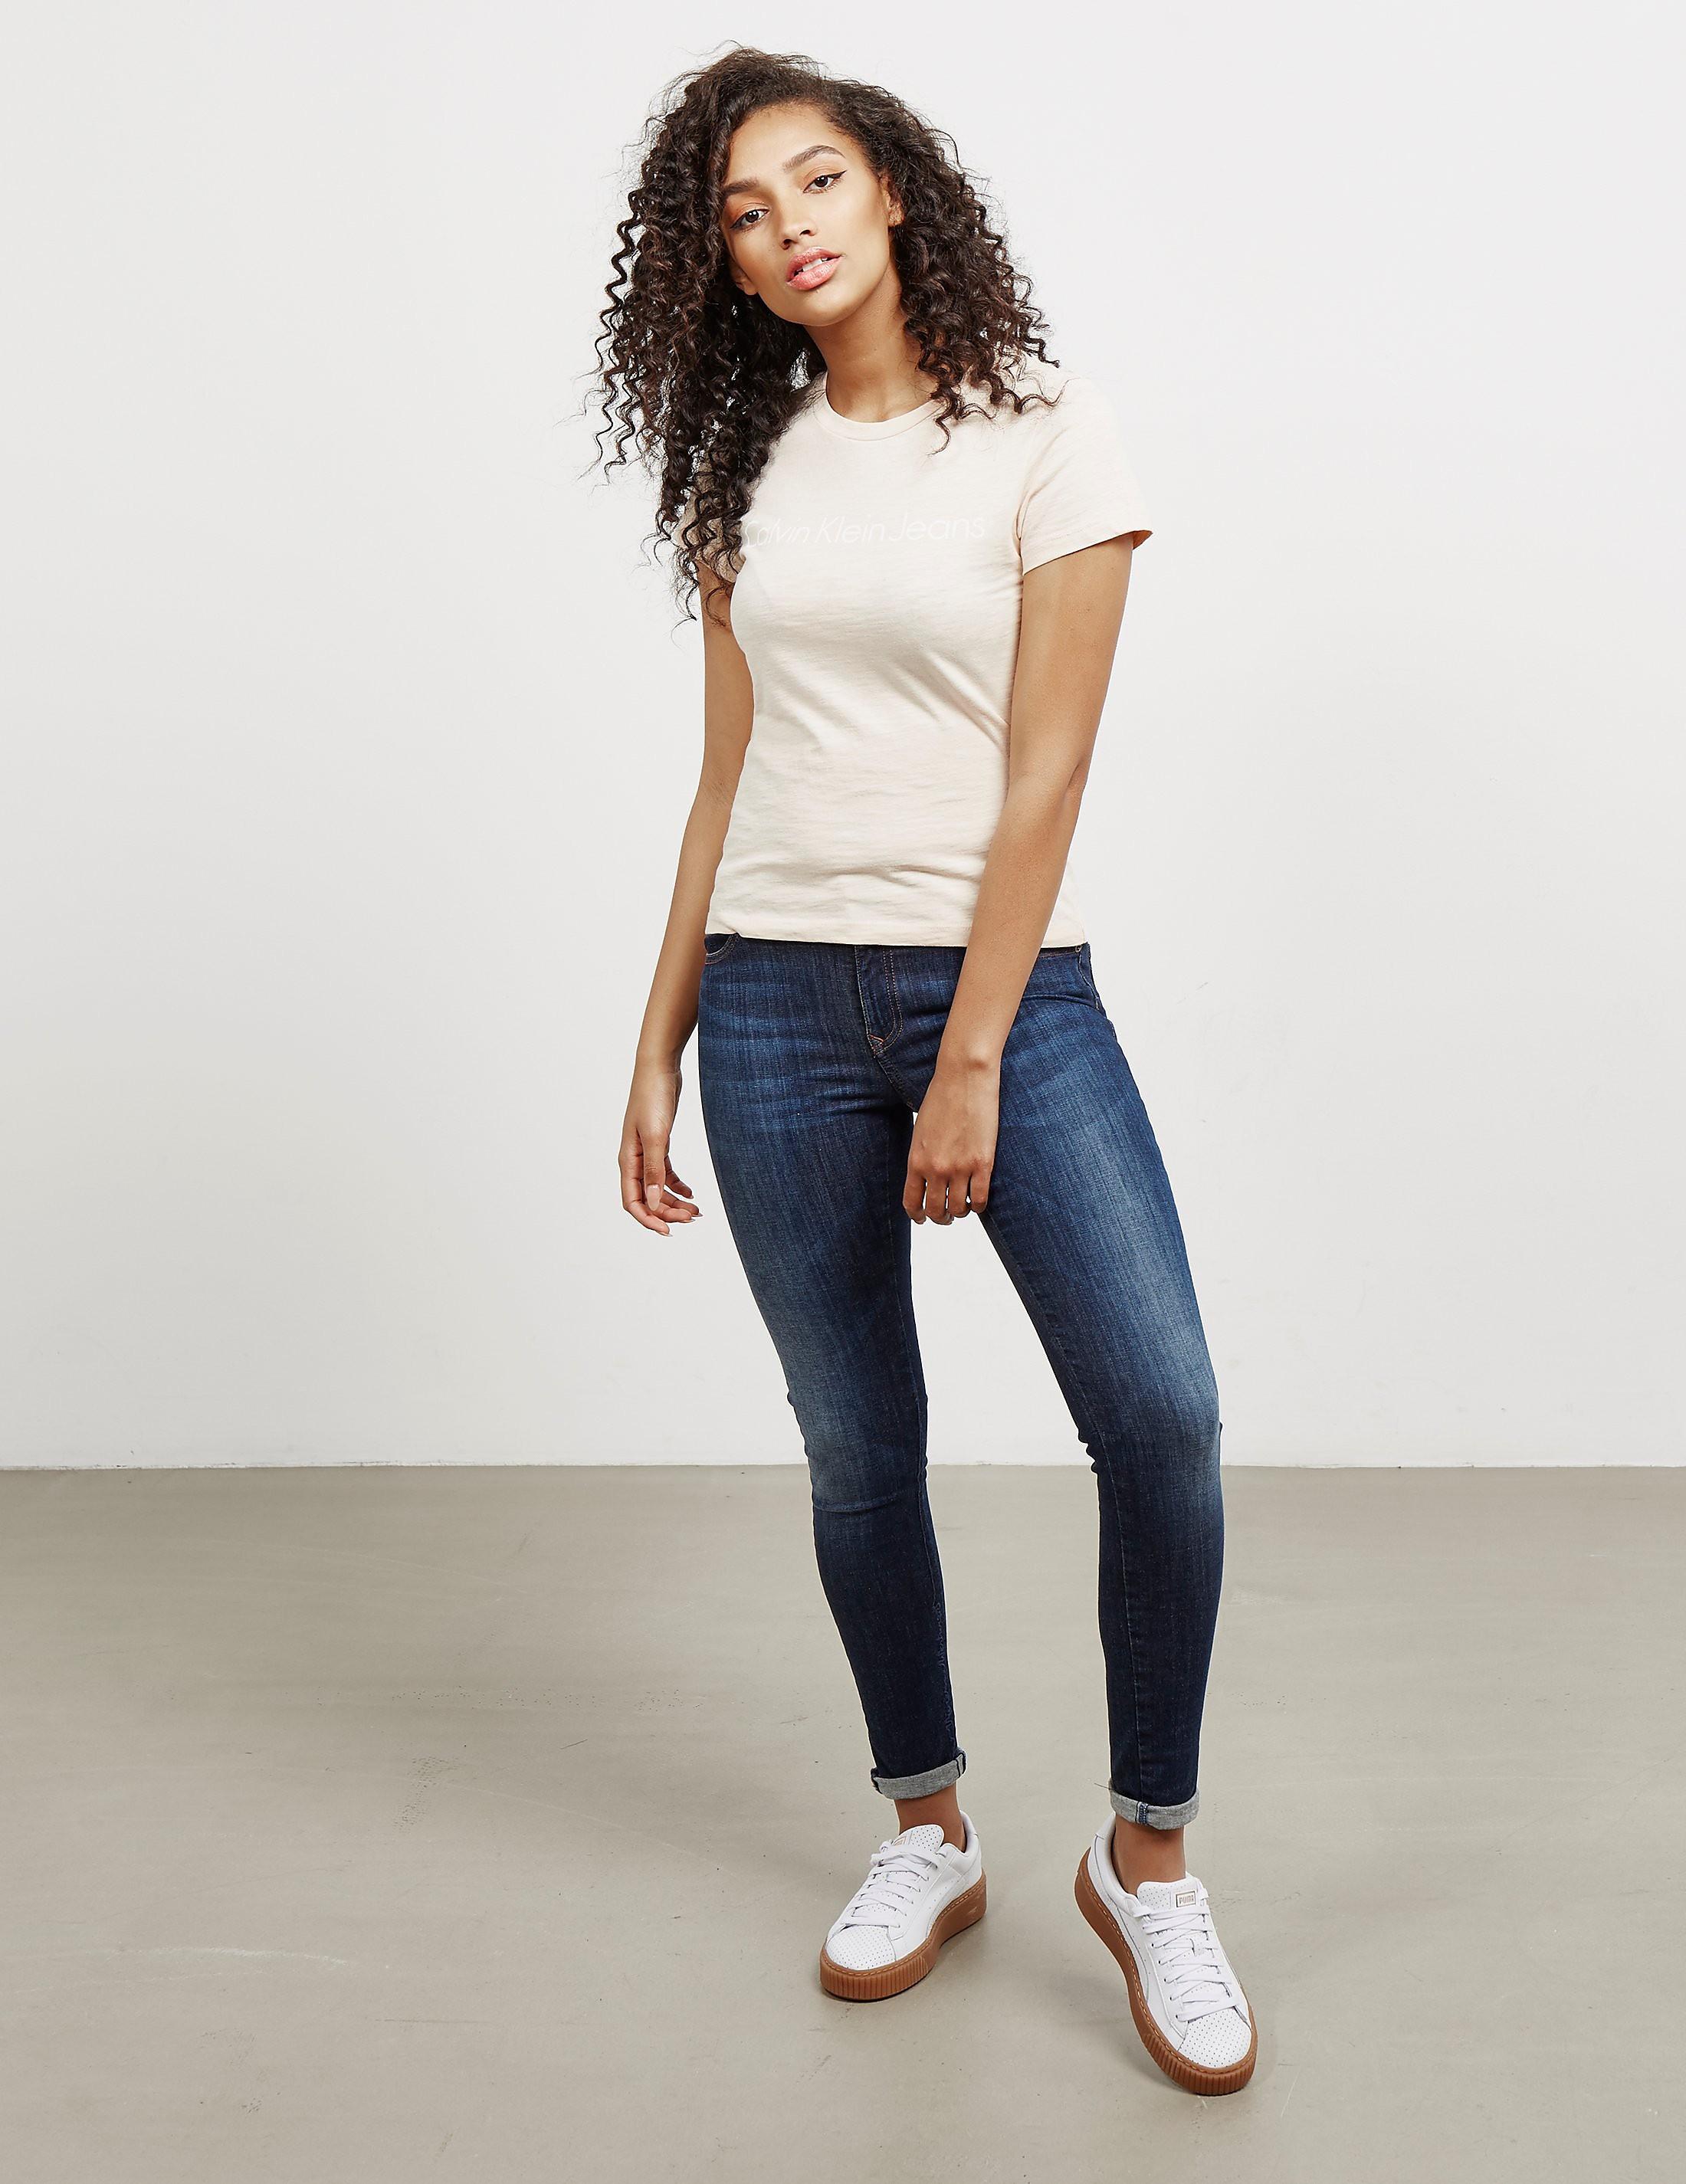 Calvin Klein Tamar-49 Short Sleeve T-Shirt